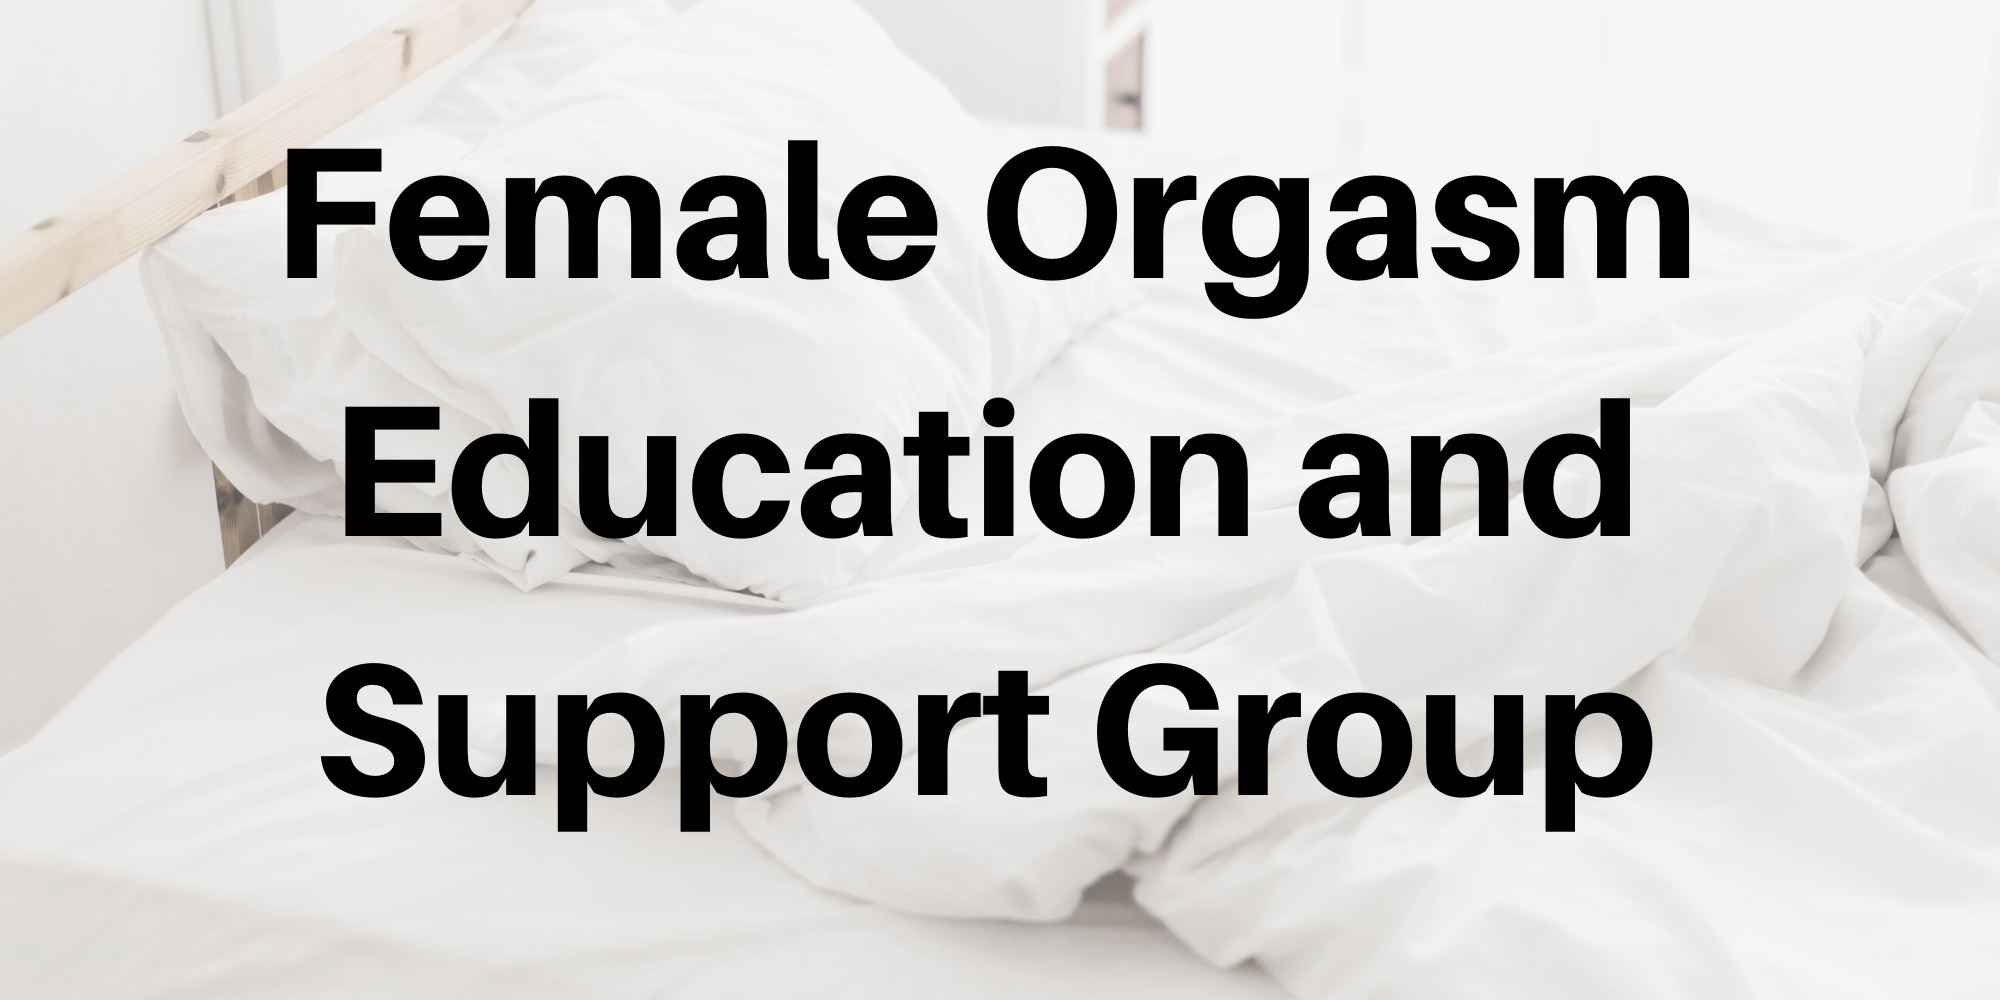 Female Orgasm Support Group- Thursday Mornings